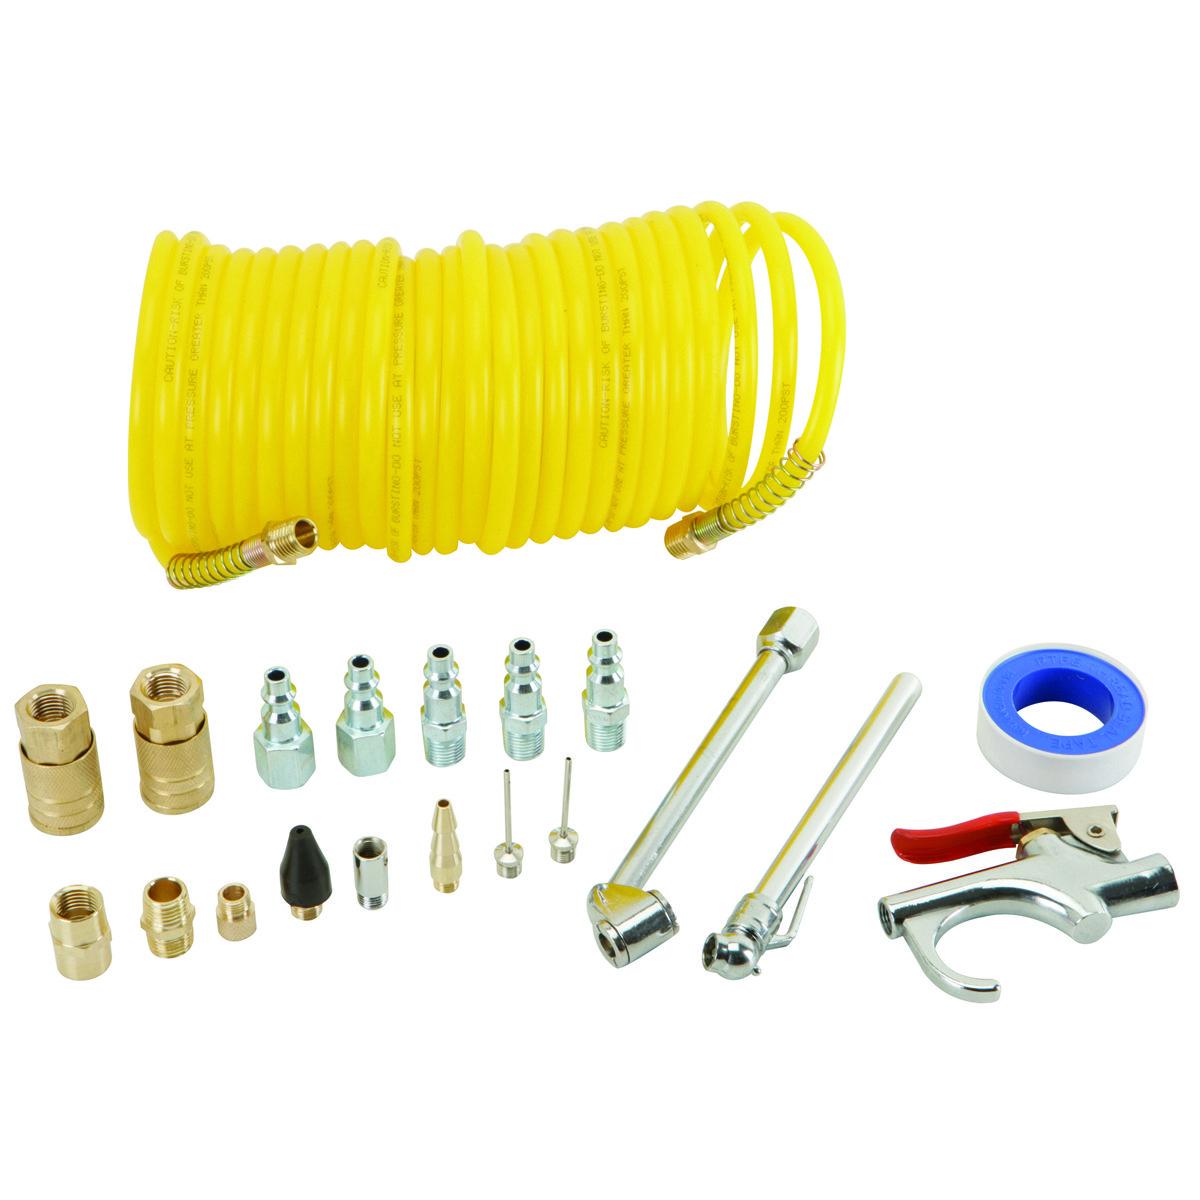 20 Piece Air Compressor Starter Kit Air compressor